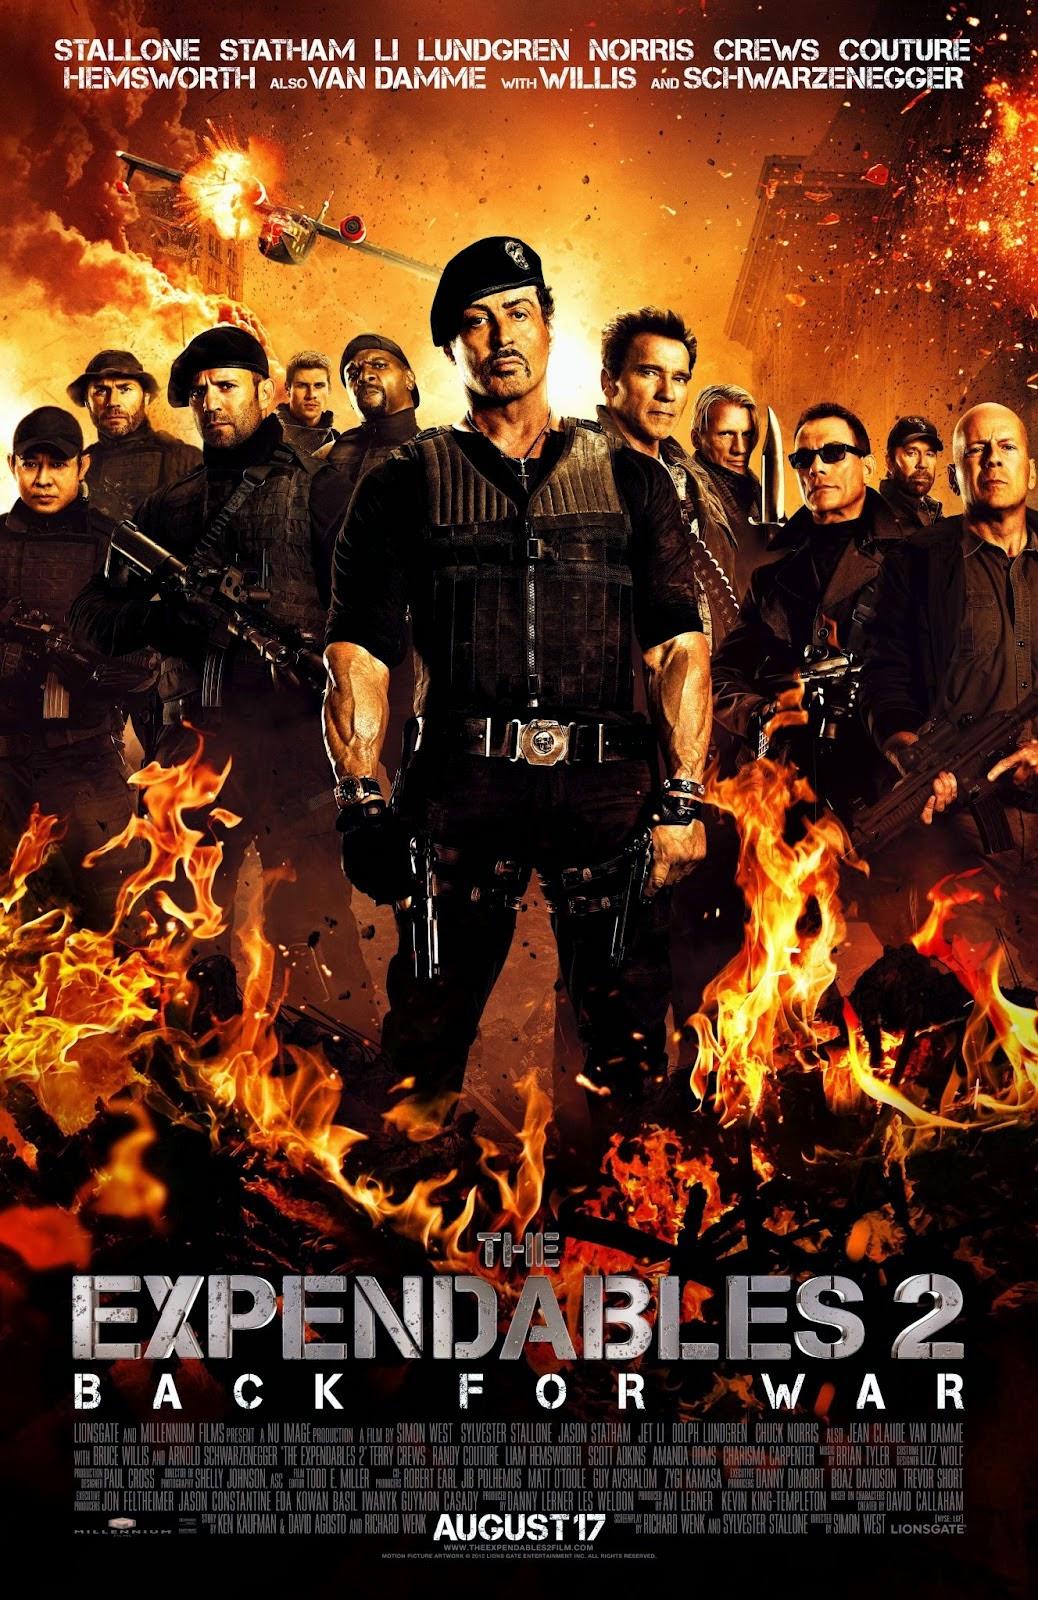 The Expendables 2 โคตรคนทีมเอ็กซ์เพนเดเบิ้ล [HD][พากย์ไทย]